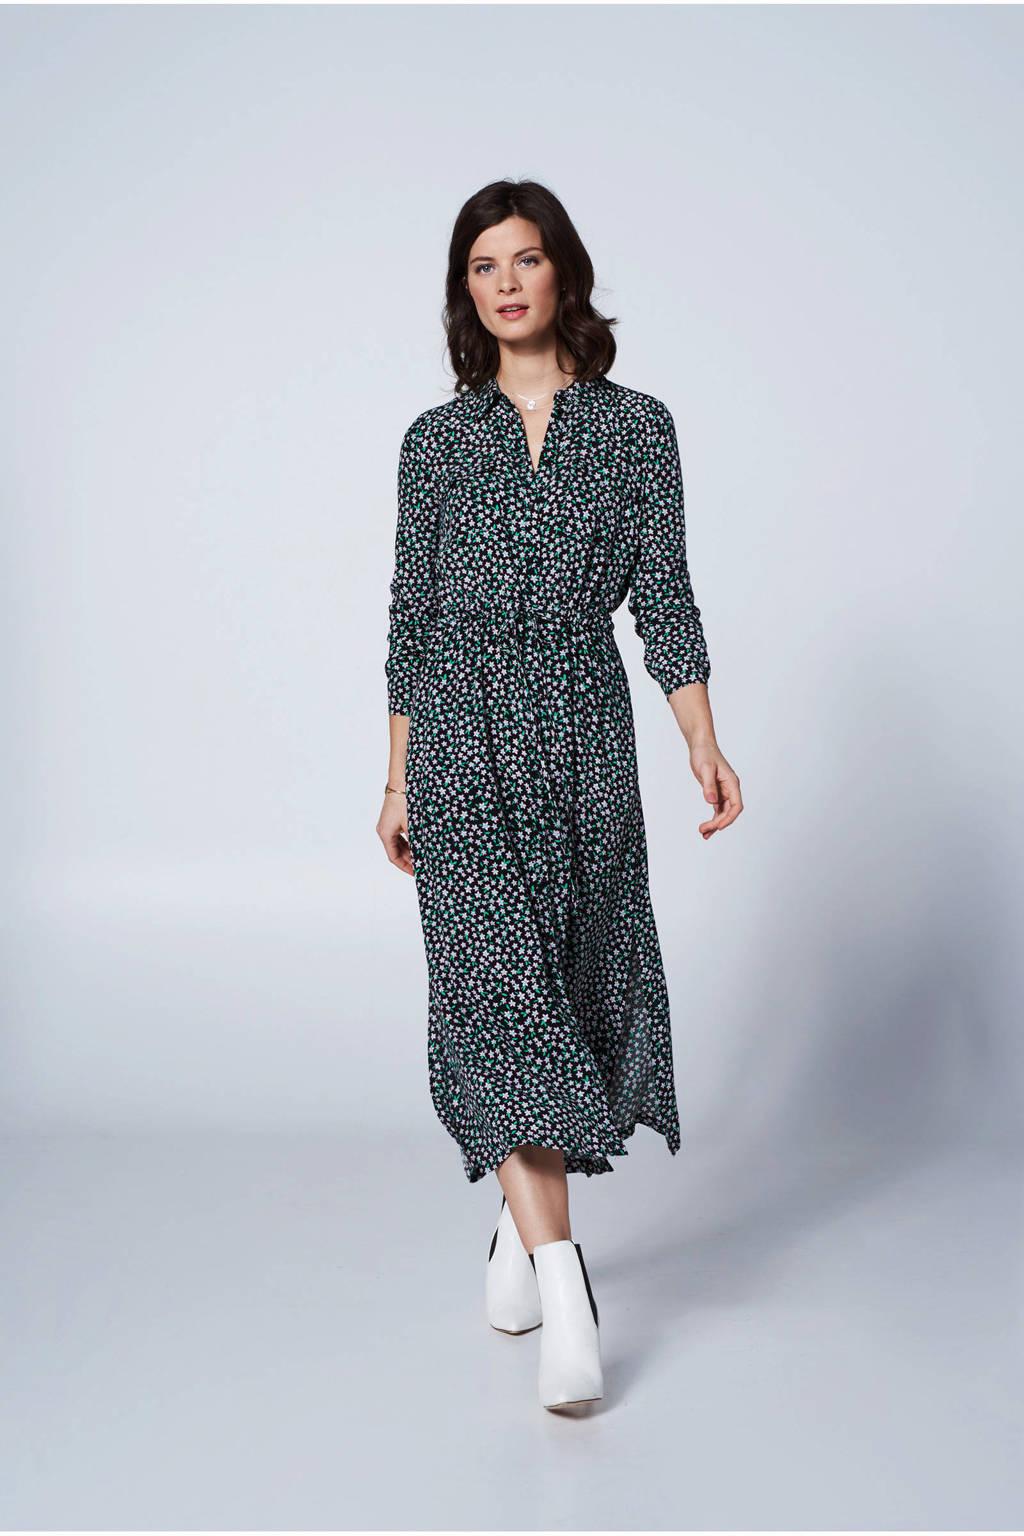 Steps gebloemde jurk, Zwart/roze/groen